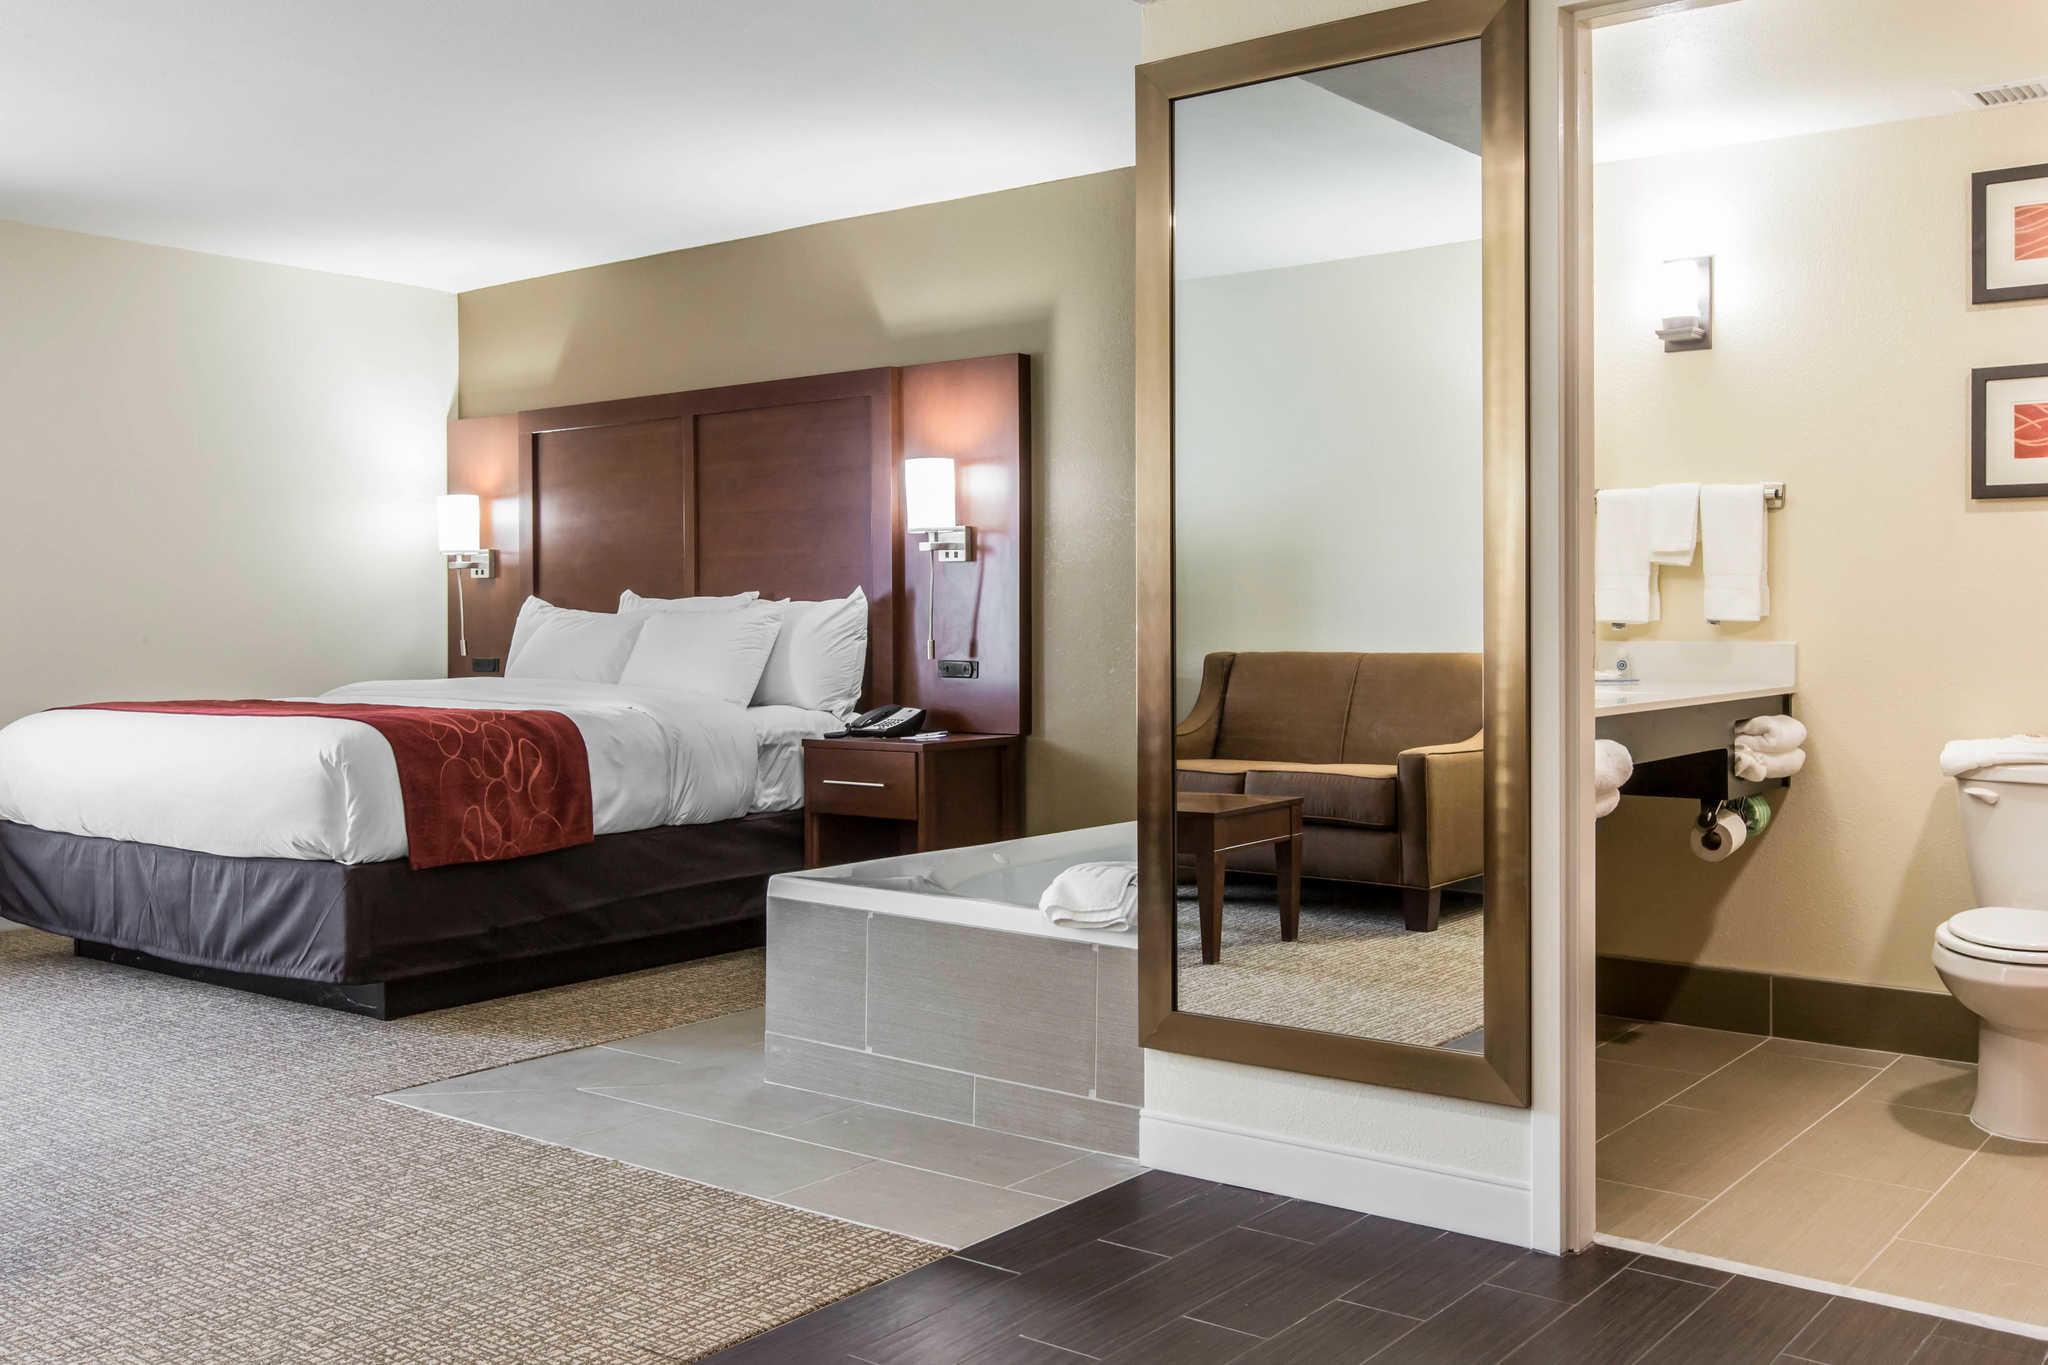 Comfort Inn & Suites West image 11